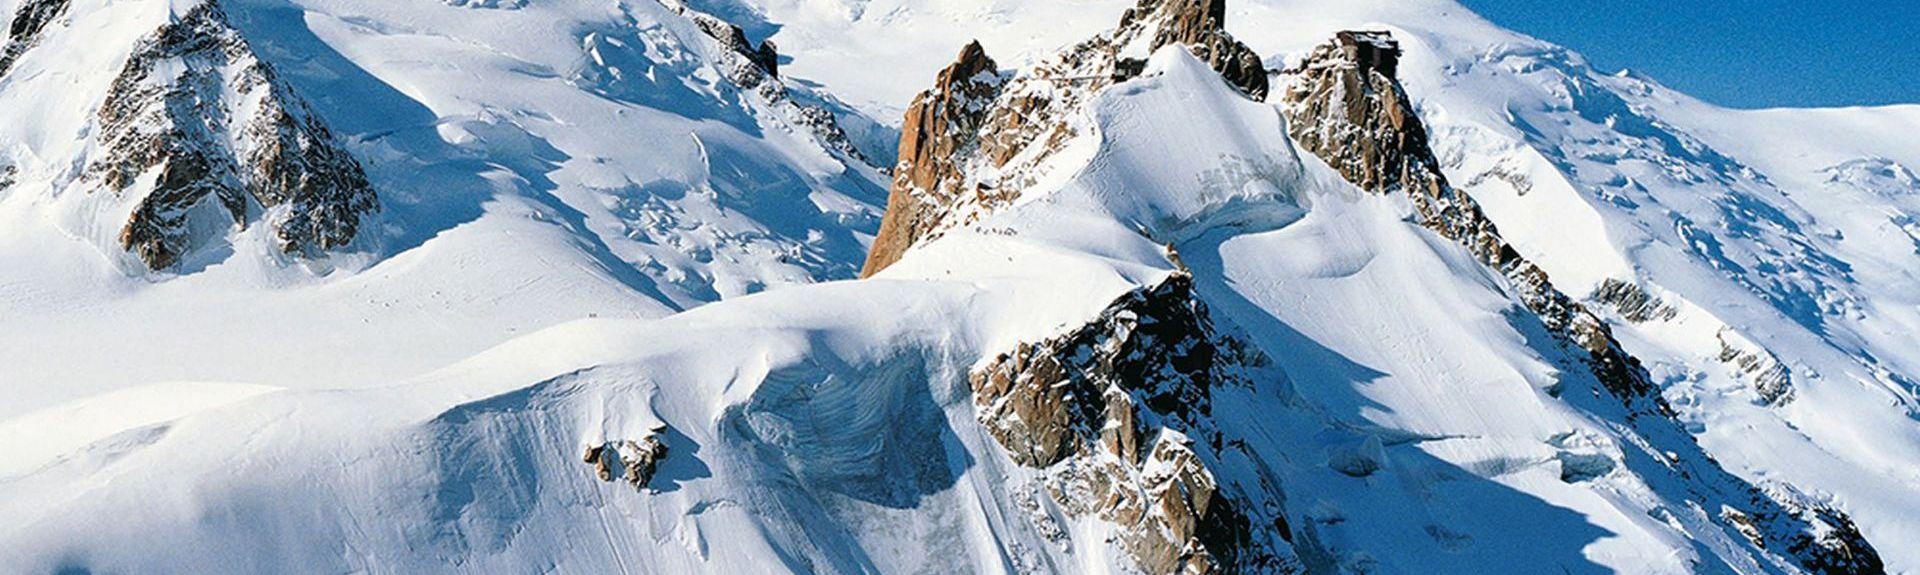 Les Bossons, Chamonix-Mont-Blanc, France